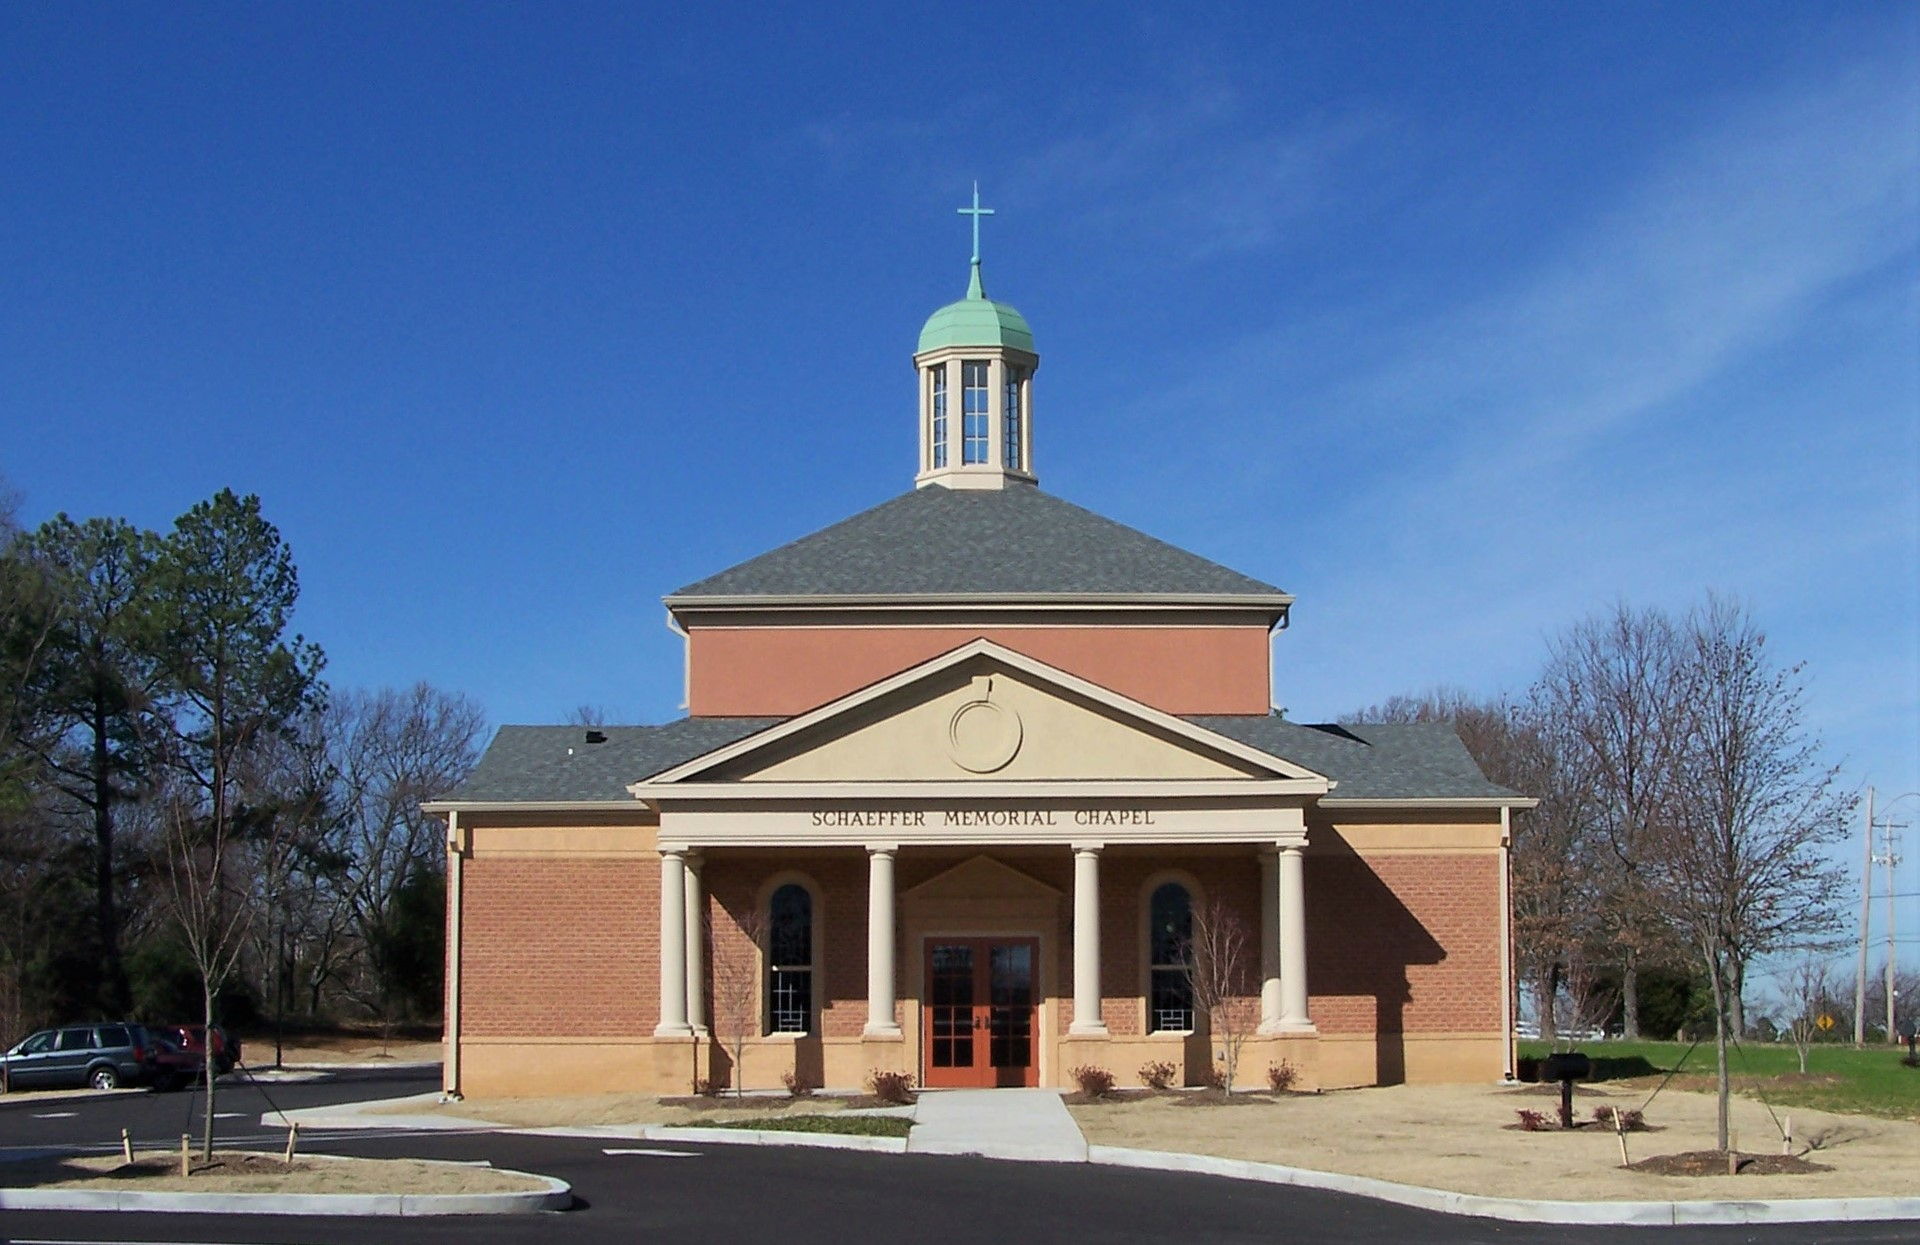 Hord - Kingsway - Schaeffer Chapel 1.jpg